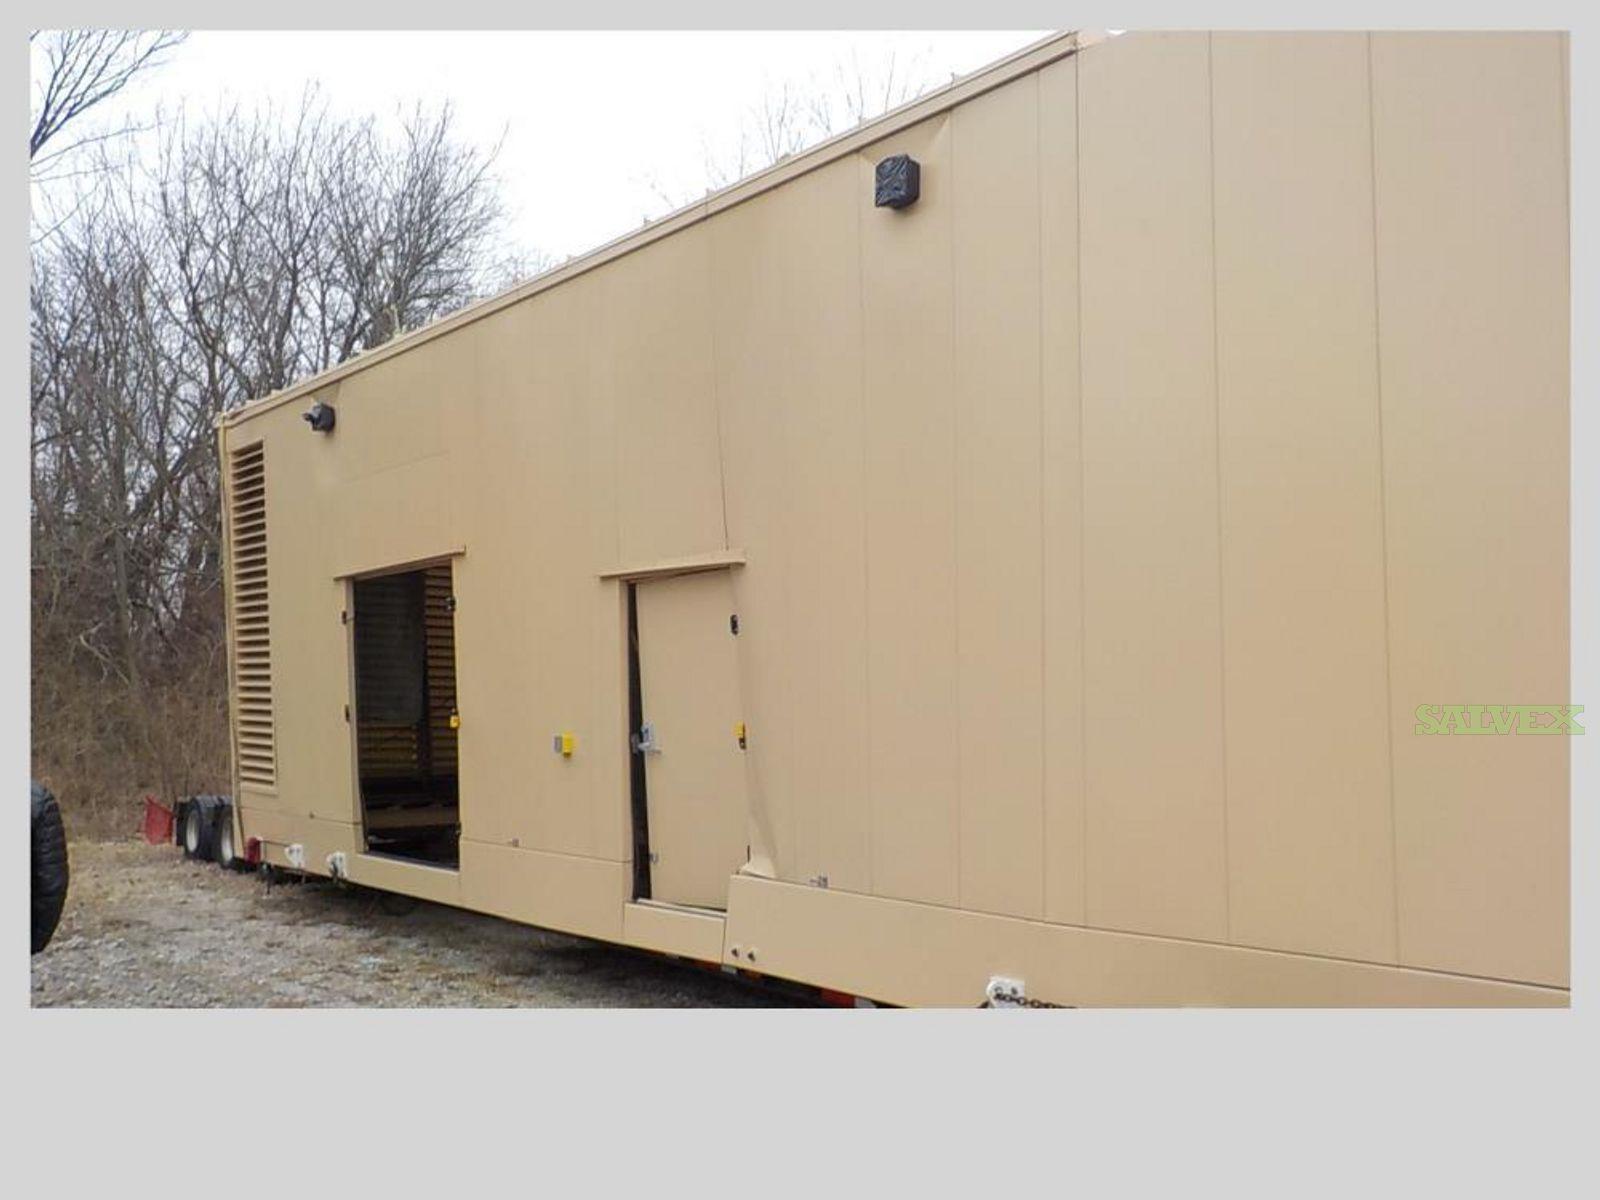 Generator Enclosure (40'x13'x15')- Damaged